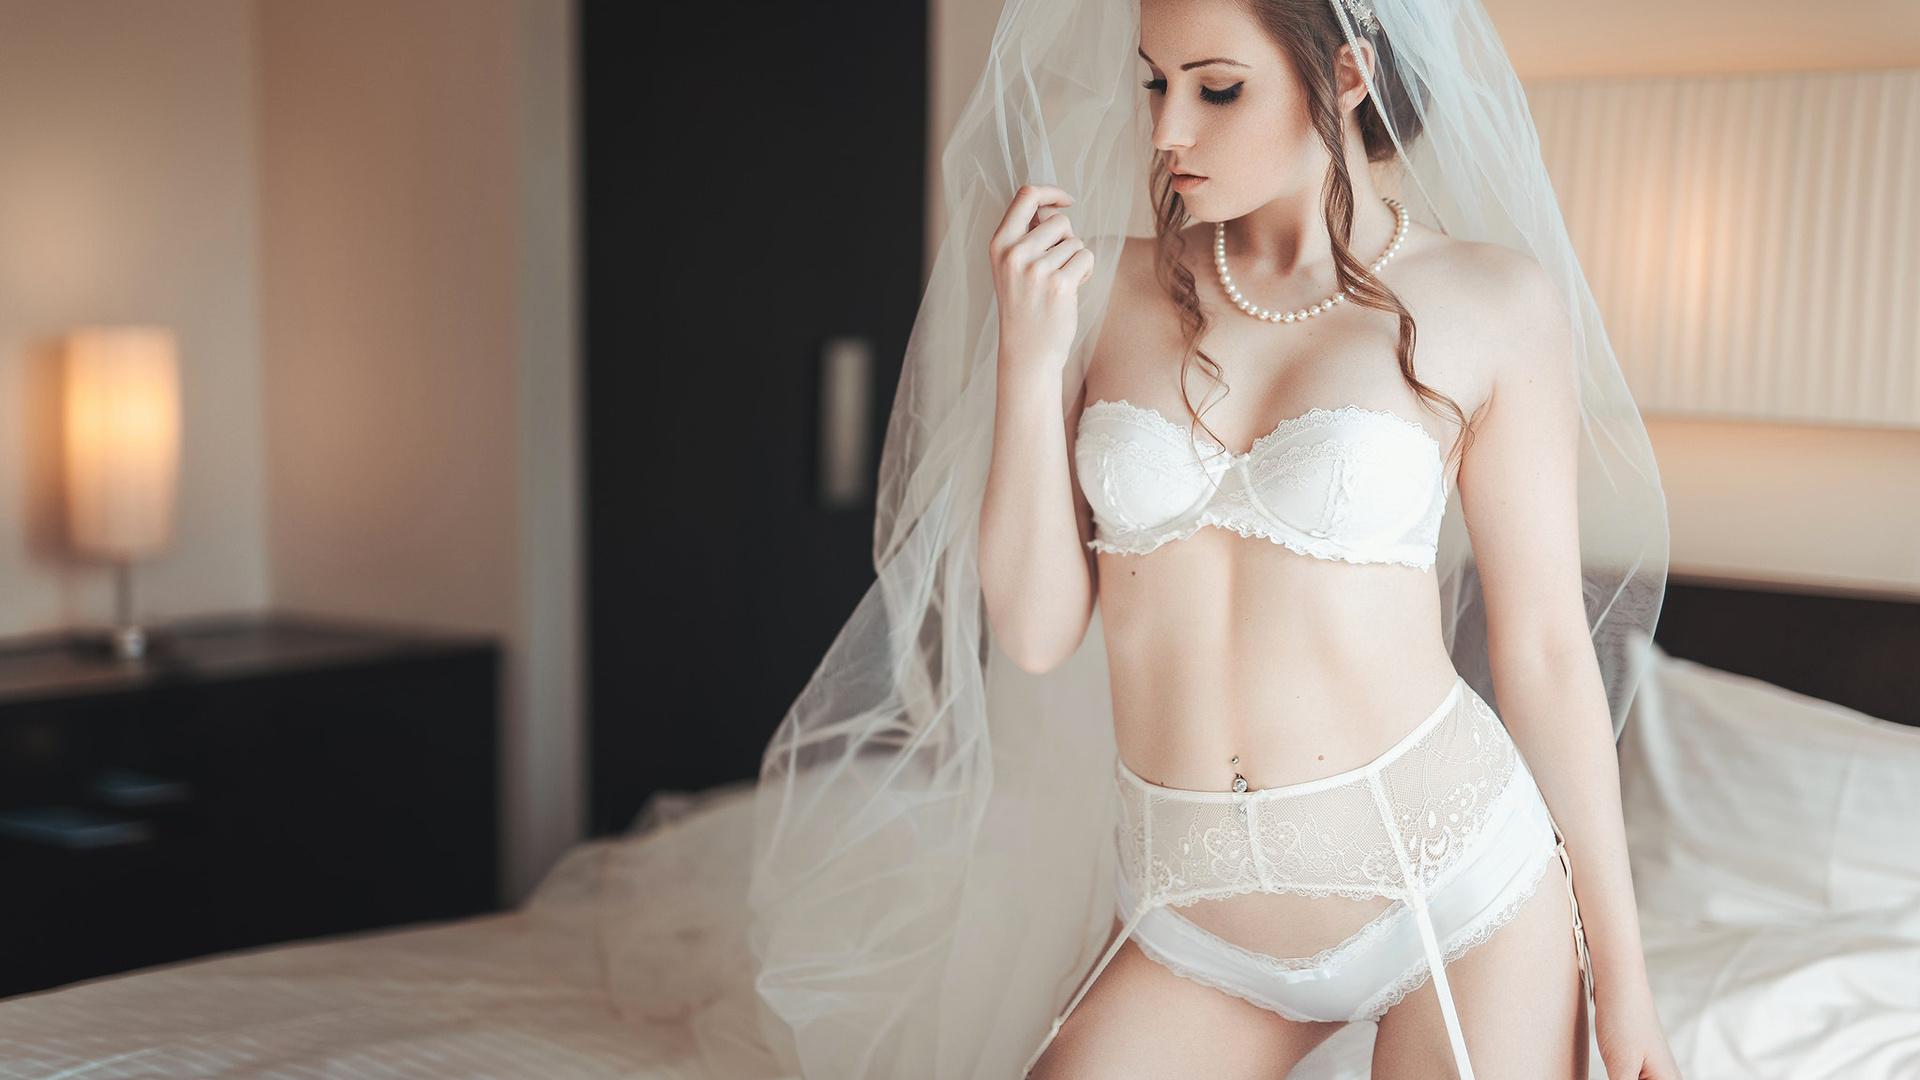 galerei-seksualnih-nevest-smotret-derevenskoe-intim-foto